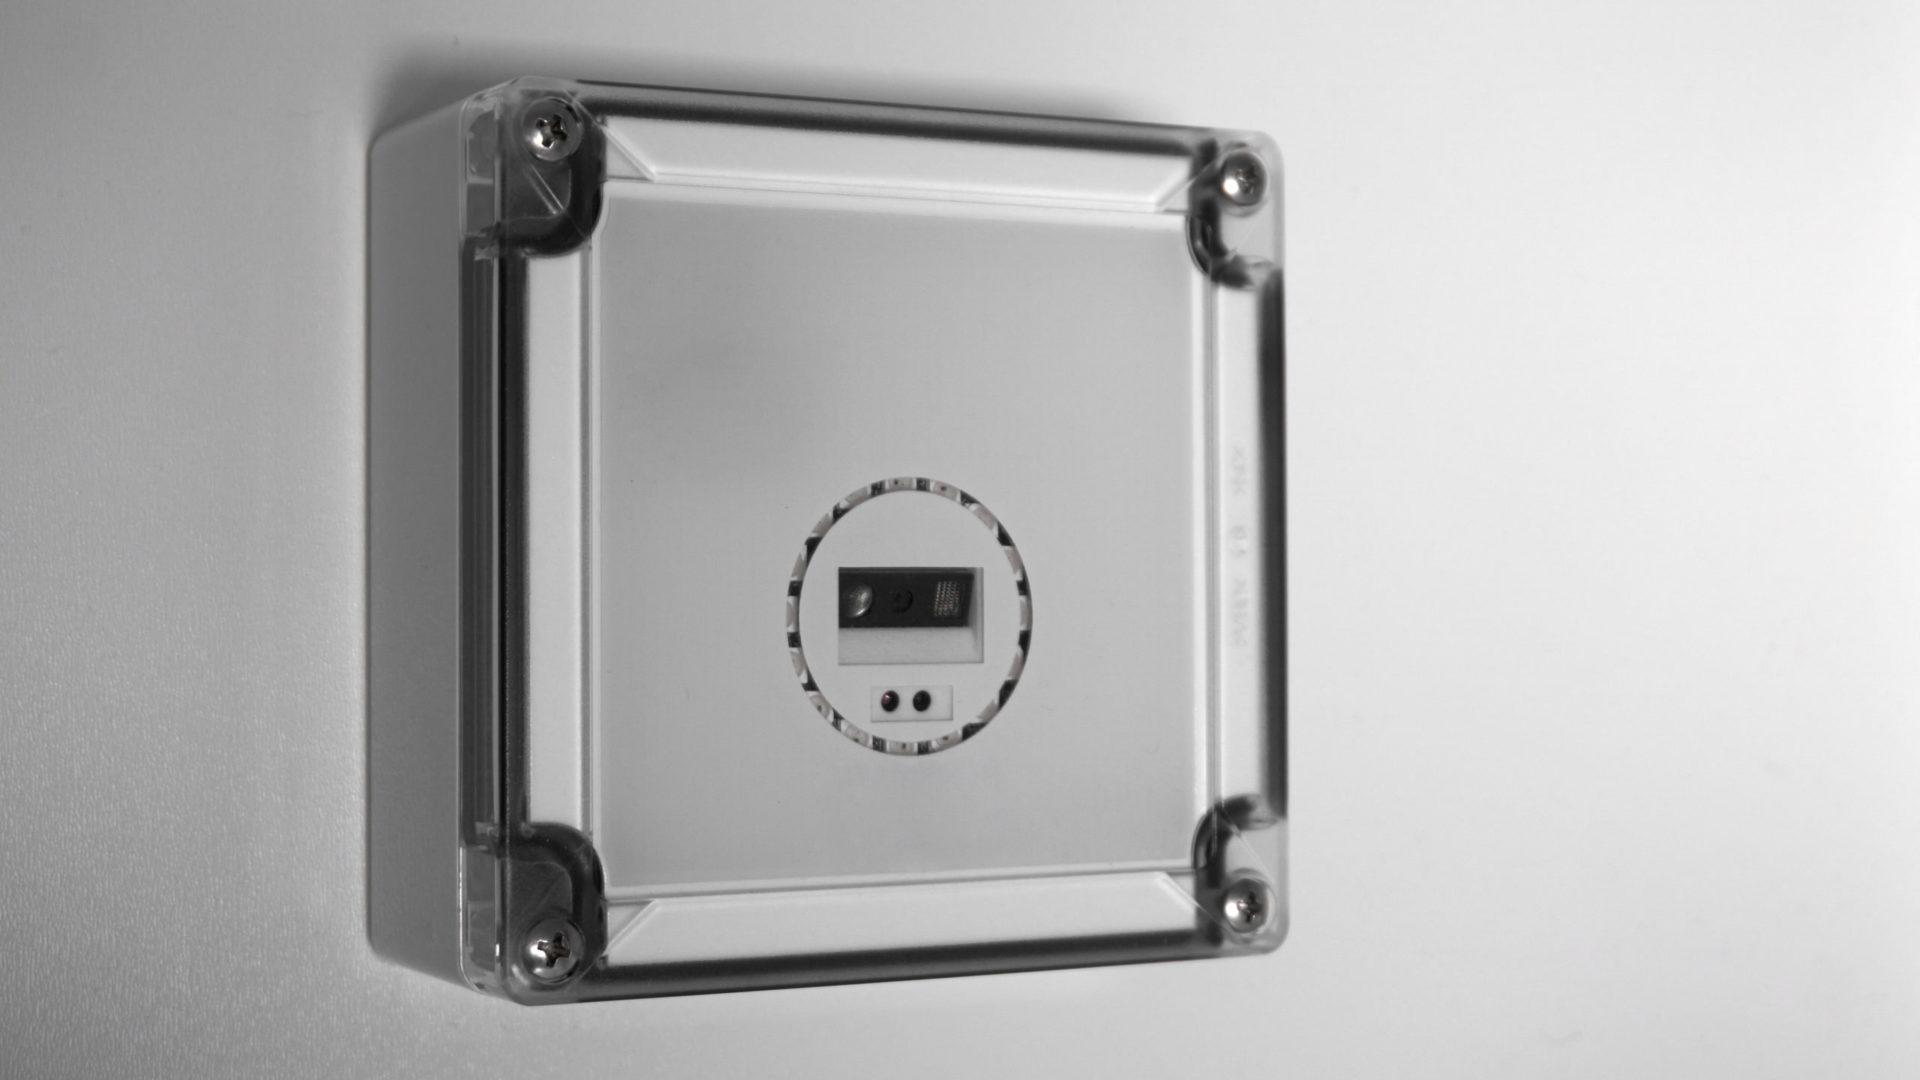 Comydo Modul in der Industrie-Variante ohne Kundenbranding.